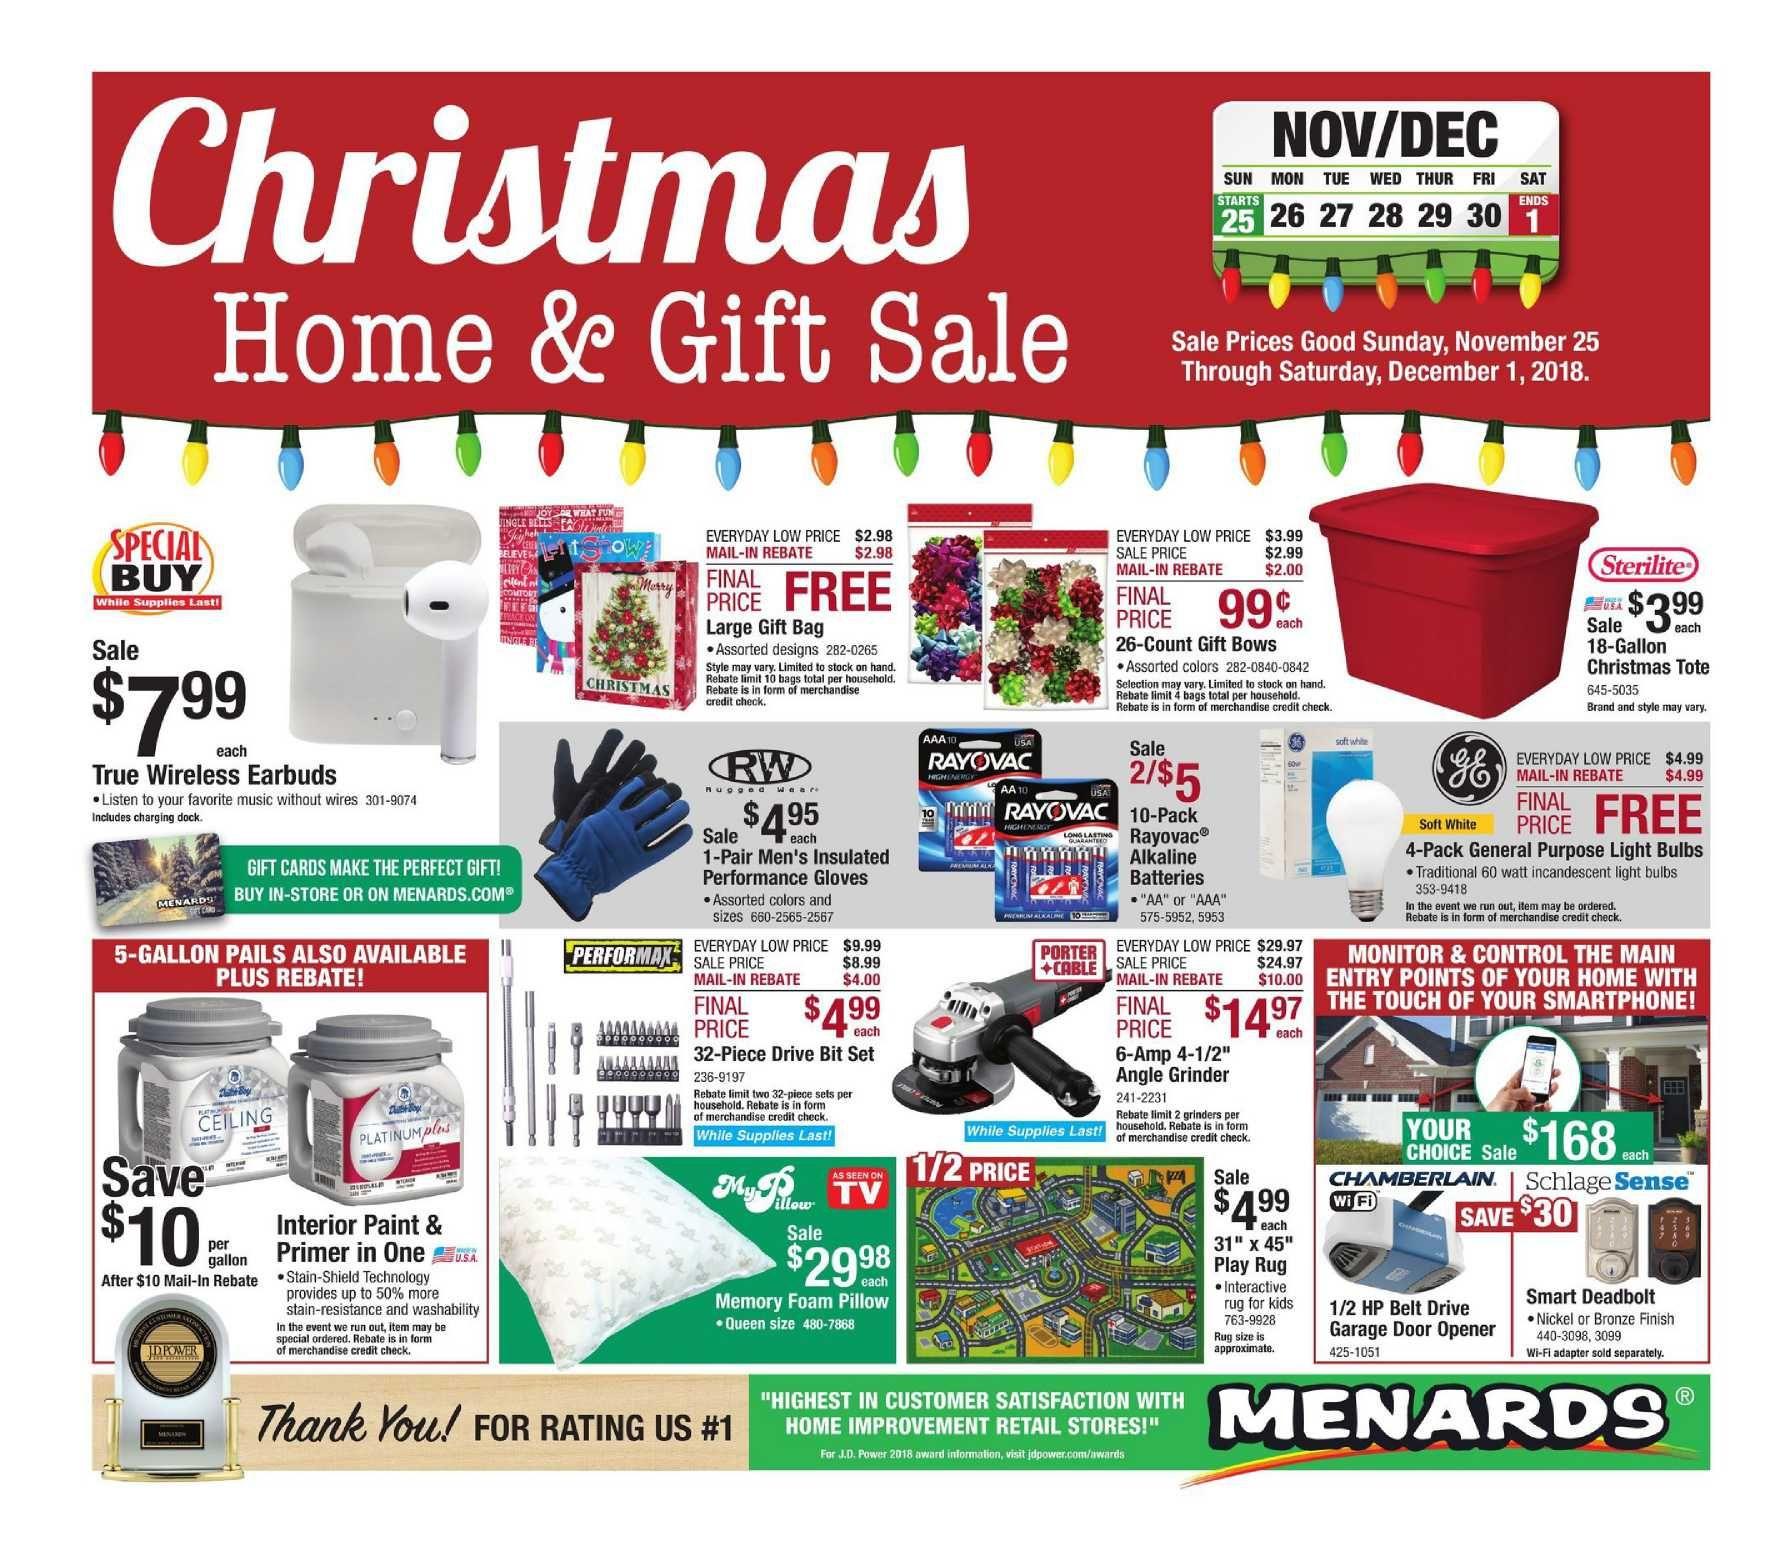 Menards Weekly Ad Flyer Feb 16 Feb 22 2020 Weeklyad123 Com Weekly Ad Circular Grocery Stores Menards Sunday Ads Flyer